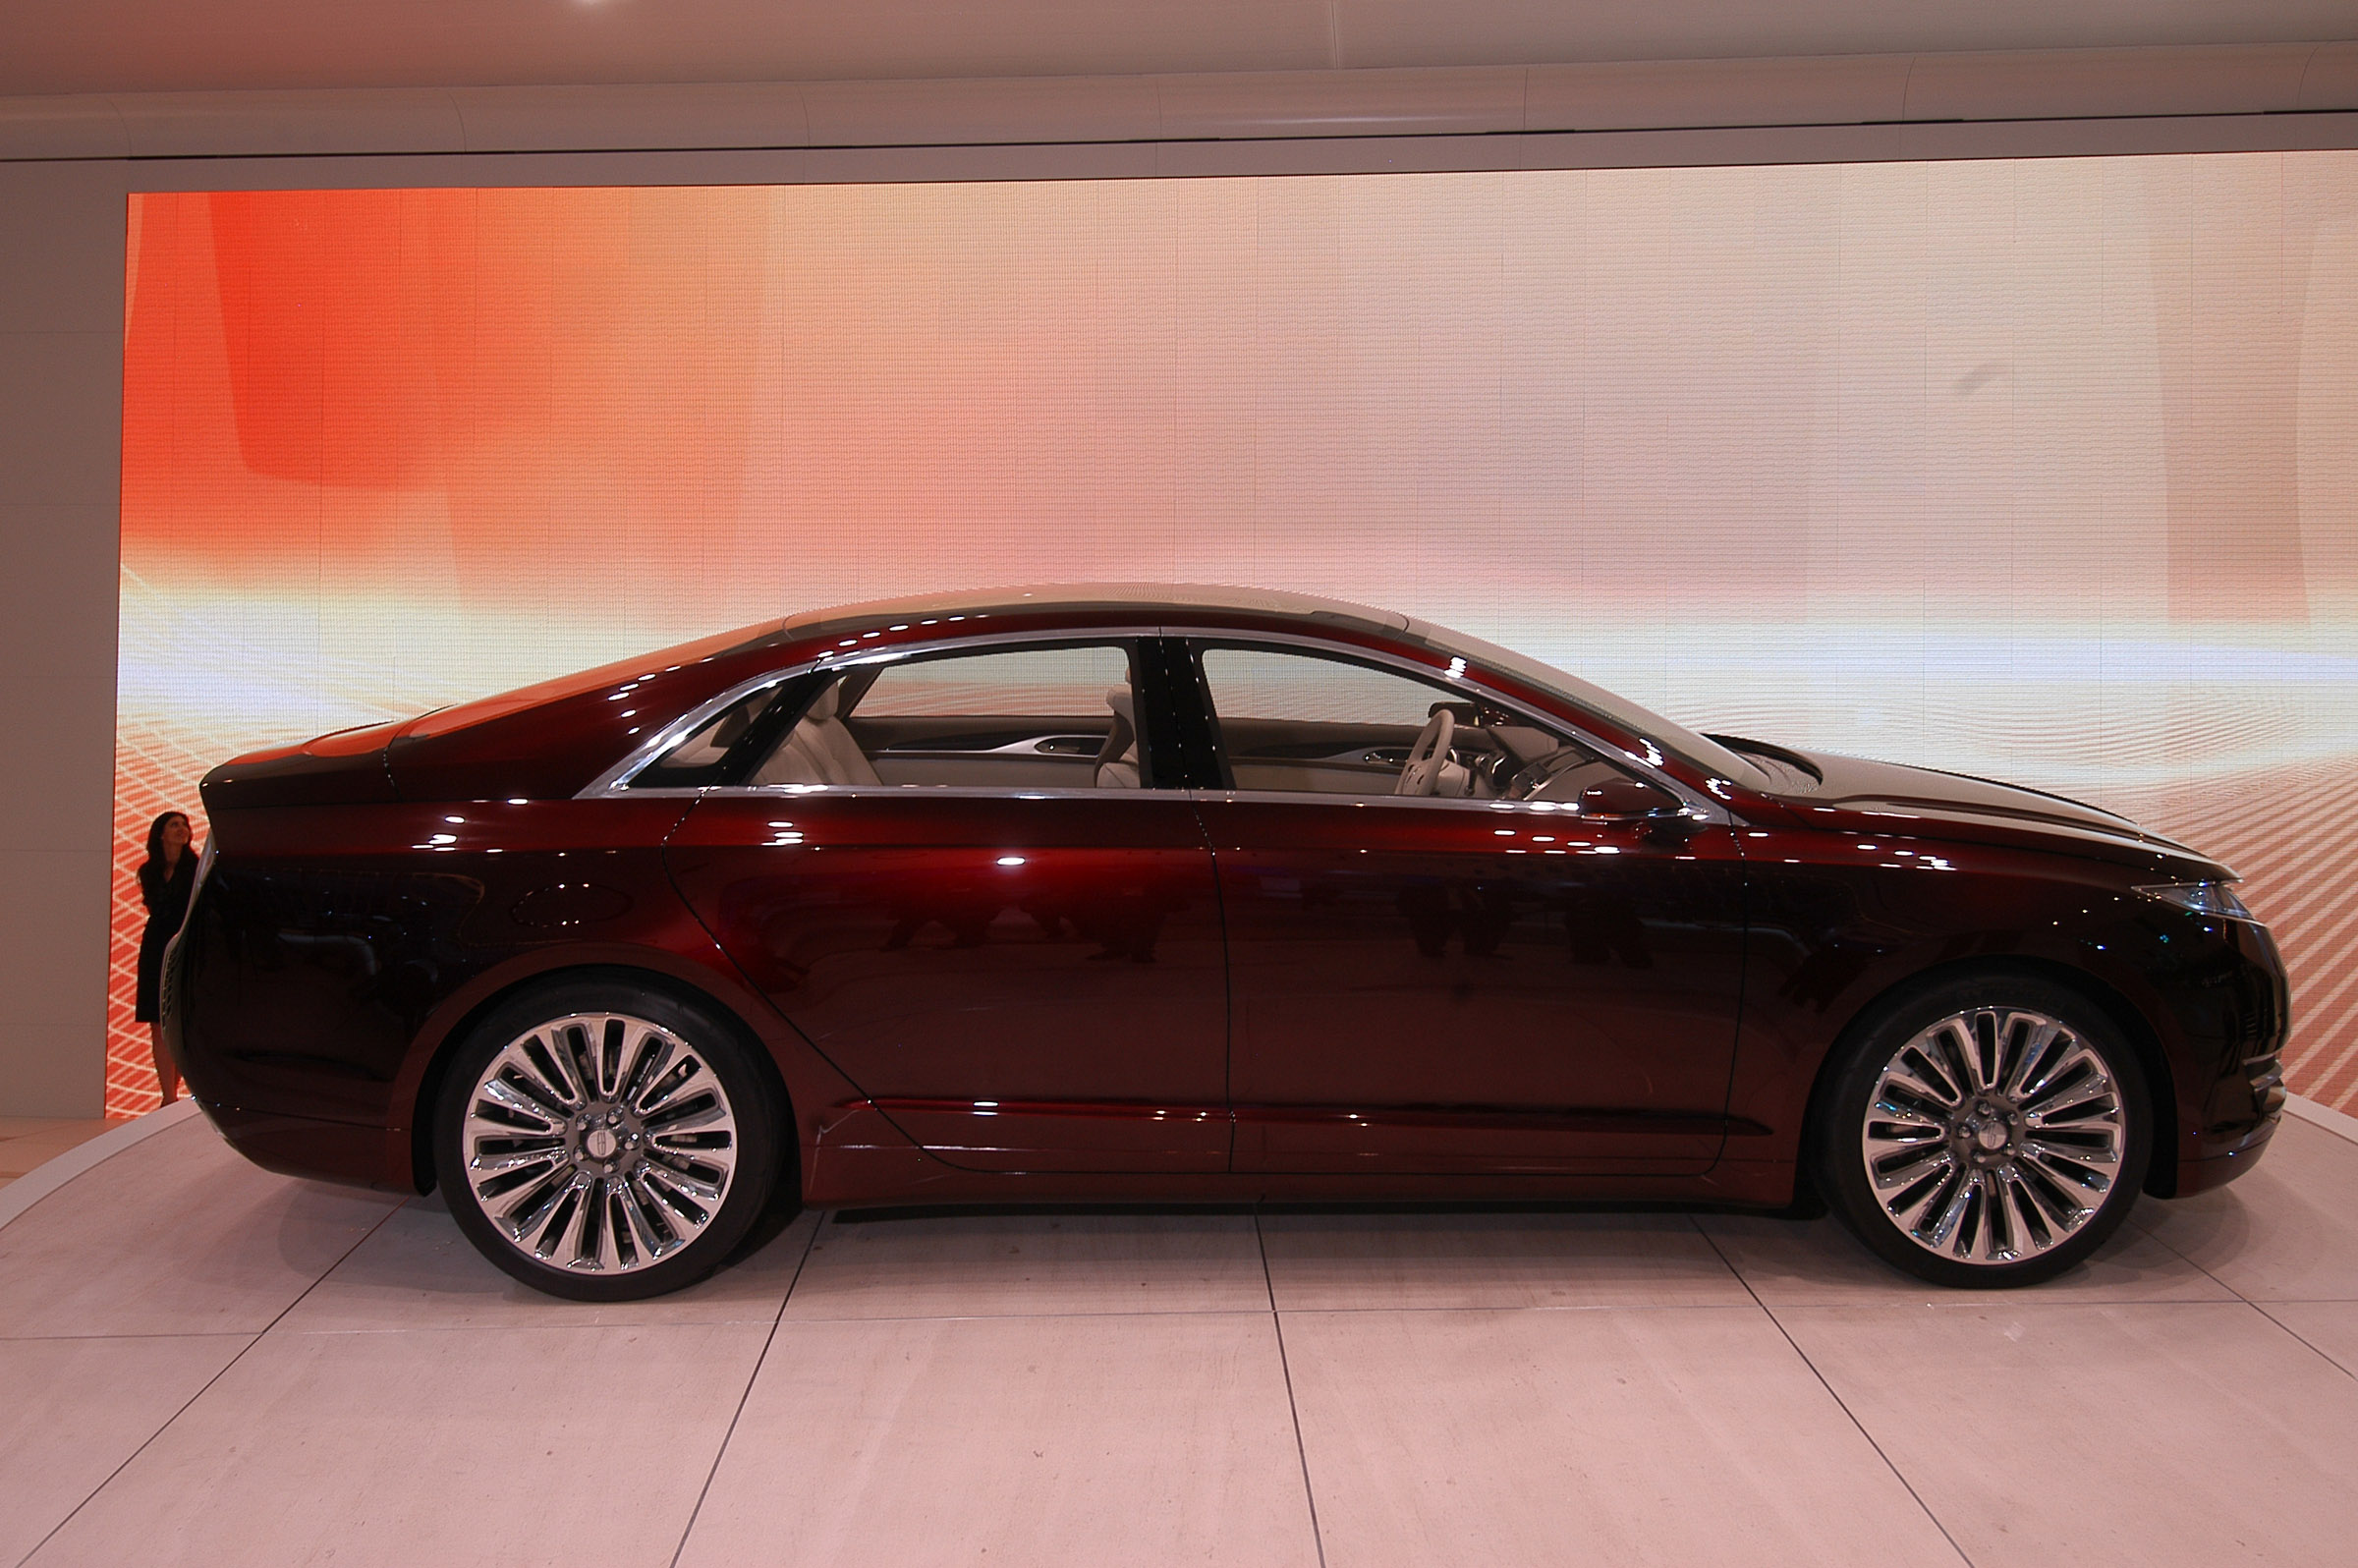 Lincoln Mkz Concept Detroit 2012 Picture 63360